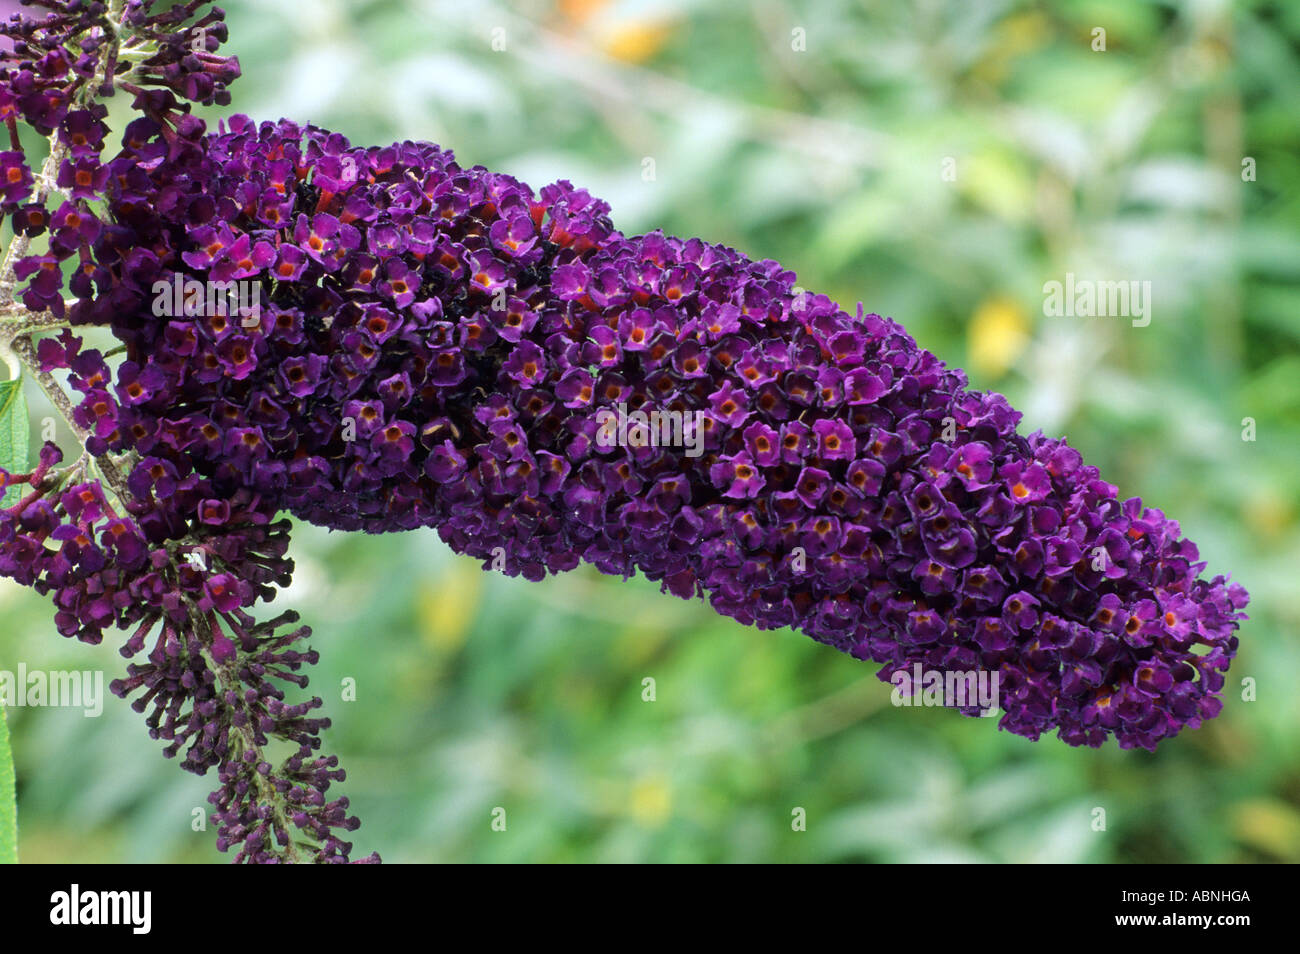 buddleia davidii 39 black knight 39 butterfly bush dark purple flower stock photo 7391689 alamy. Black Bedroom Furniture Sets. Home Design Ideas